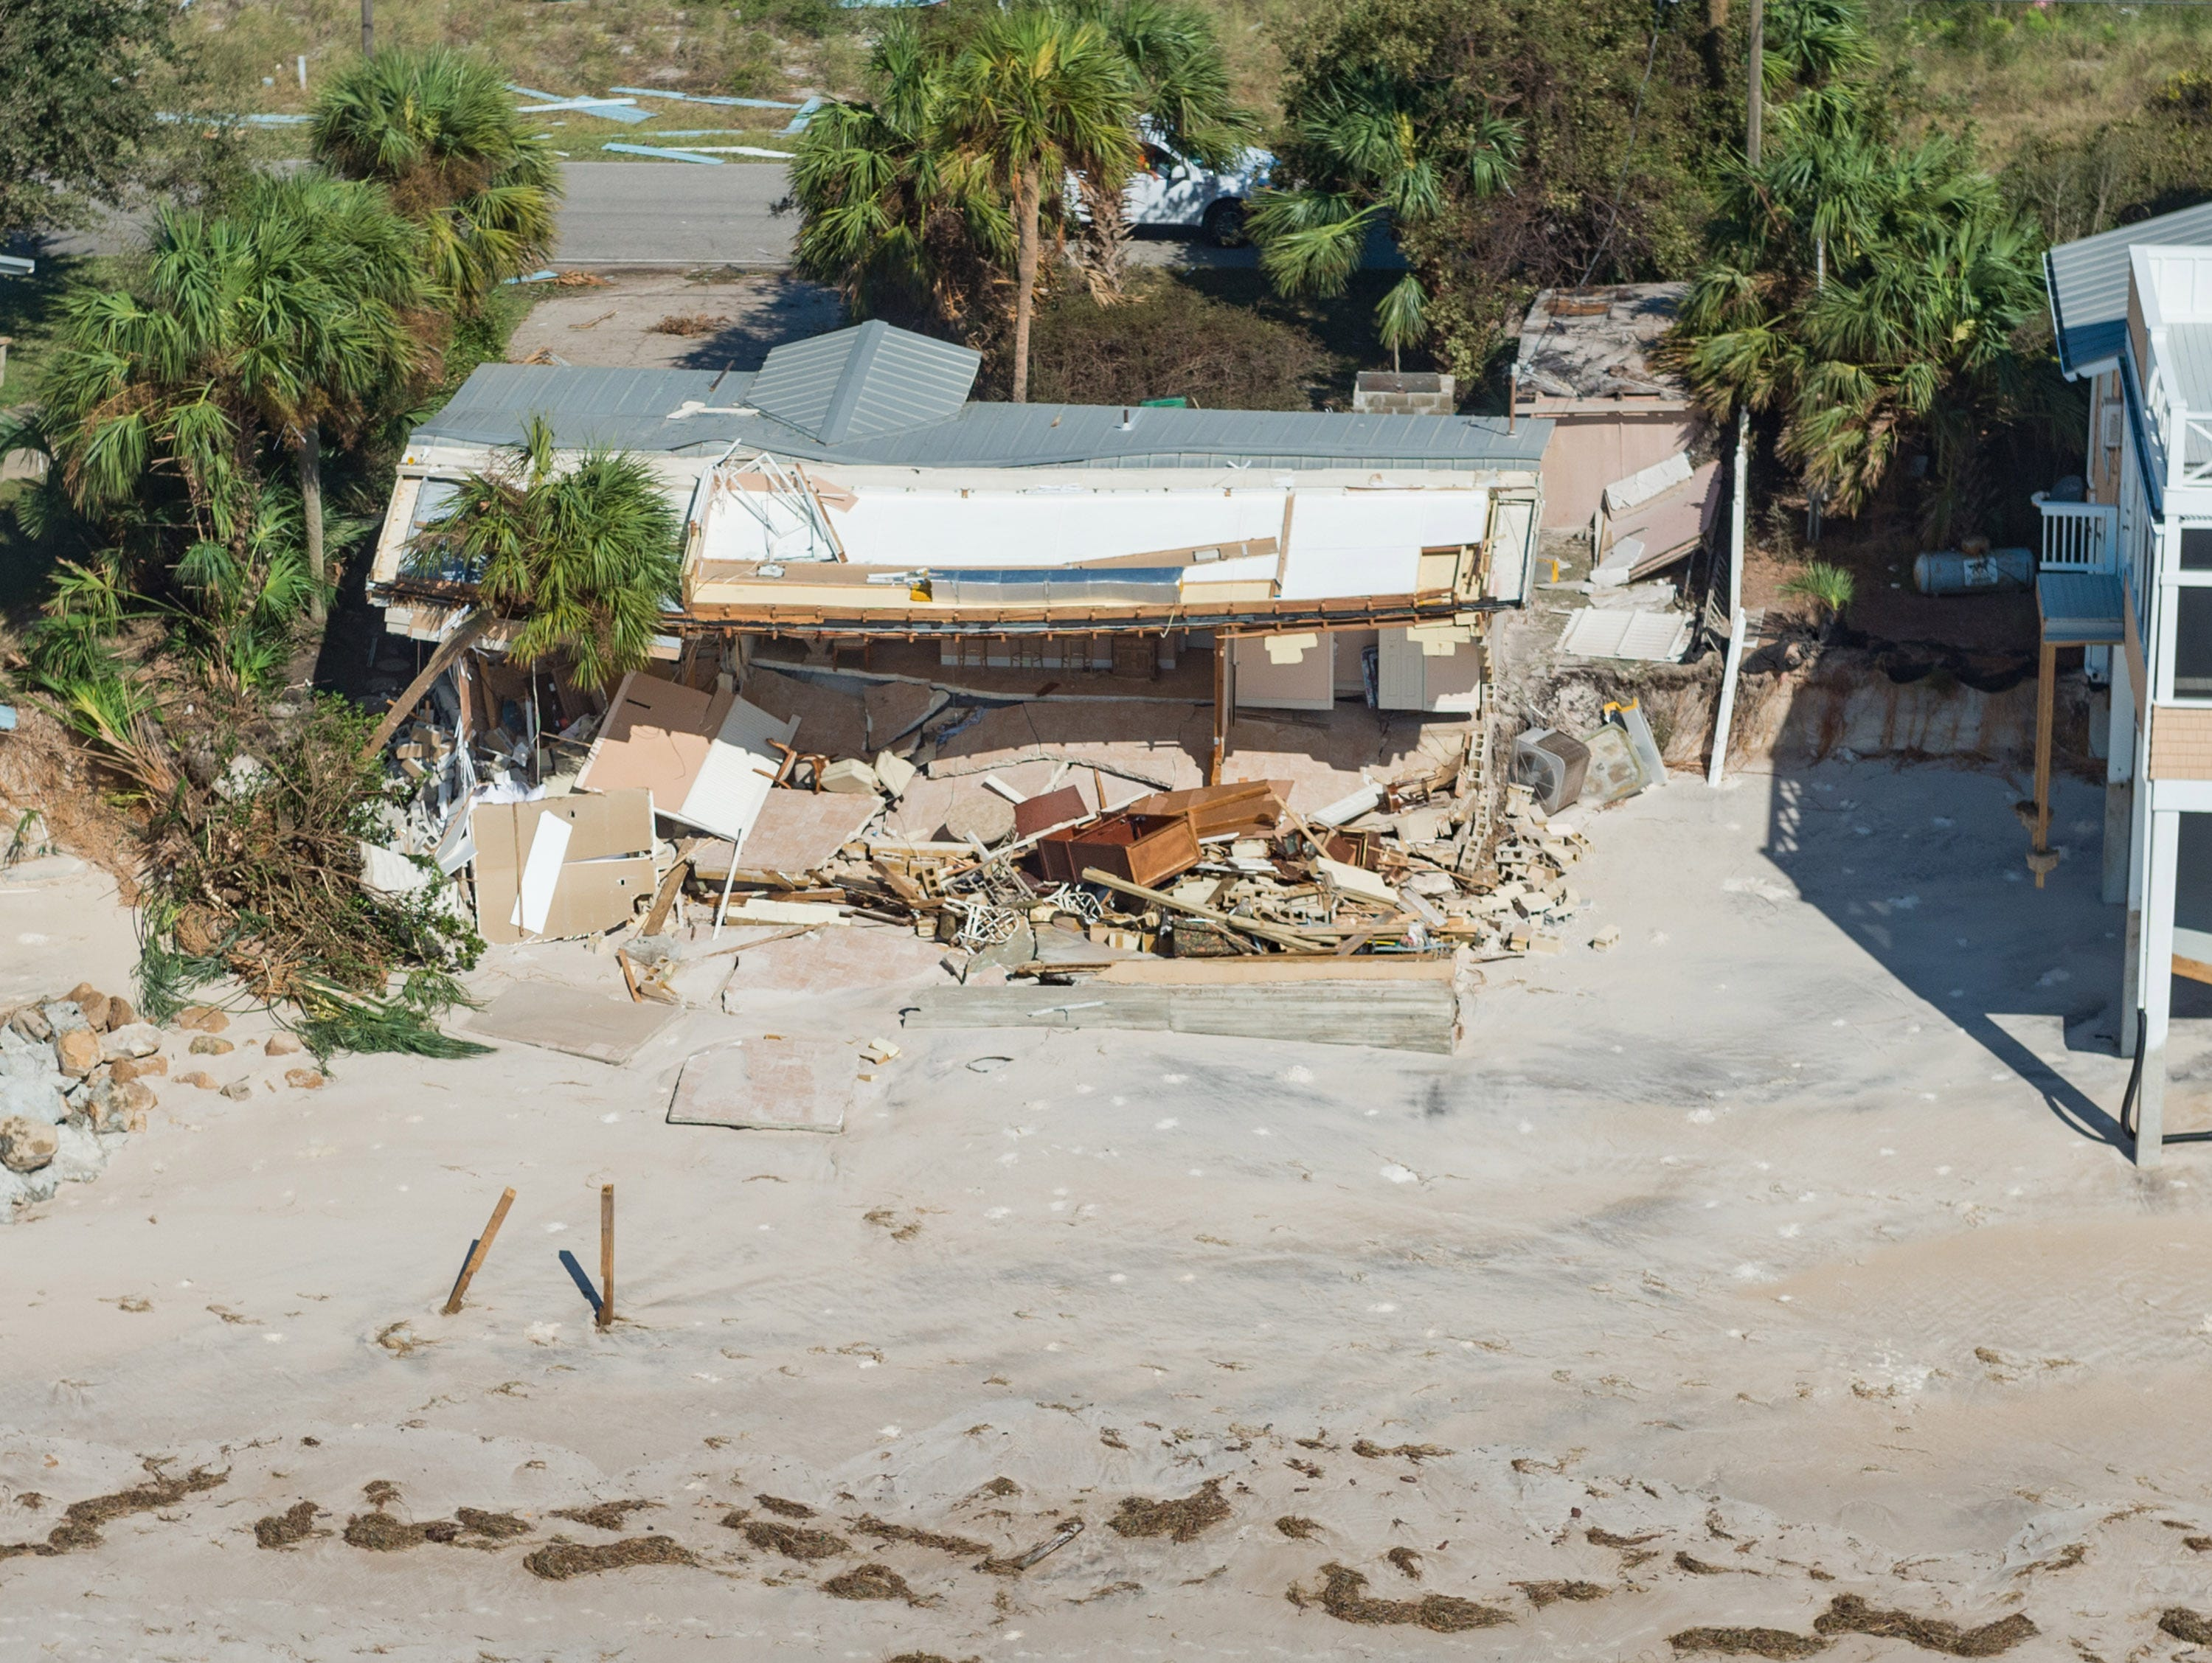 Oct 11, 2018; St Theresa Beach, FL, USA; Aerial photos of the aftermath of Hurricane Michael on St Theresa Beach. Mandatory Credit: Kinfay Moroti/The News-Press